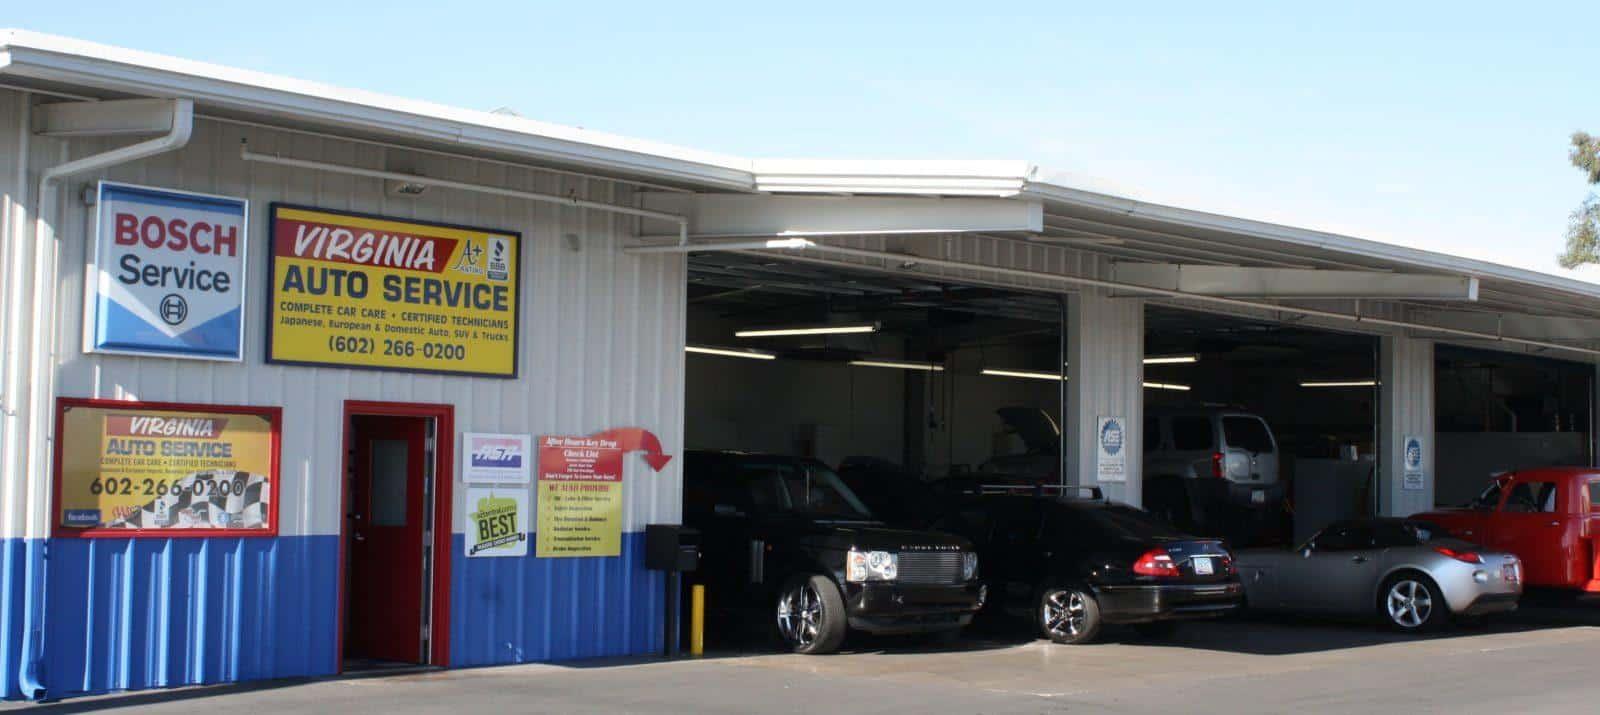 Virginia Auto Service, Phoenix, Arizona